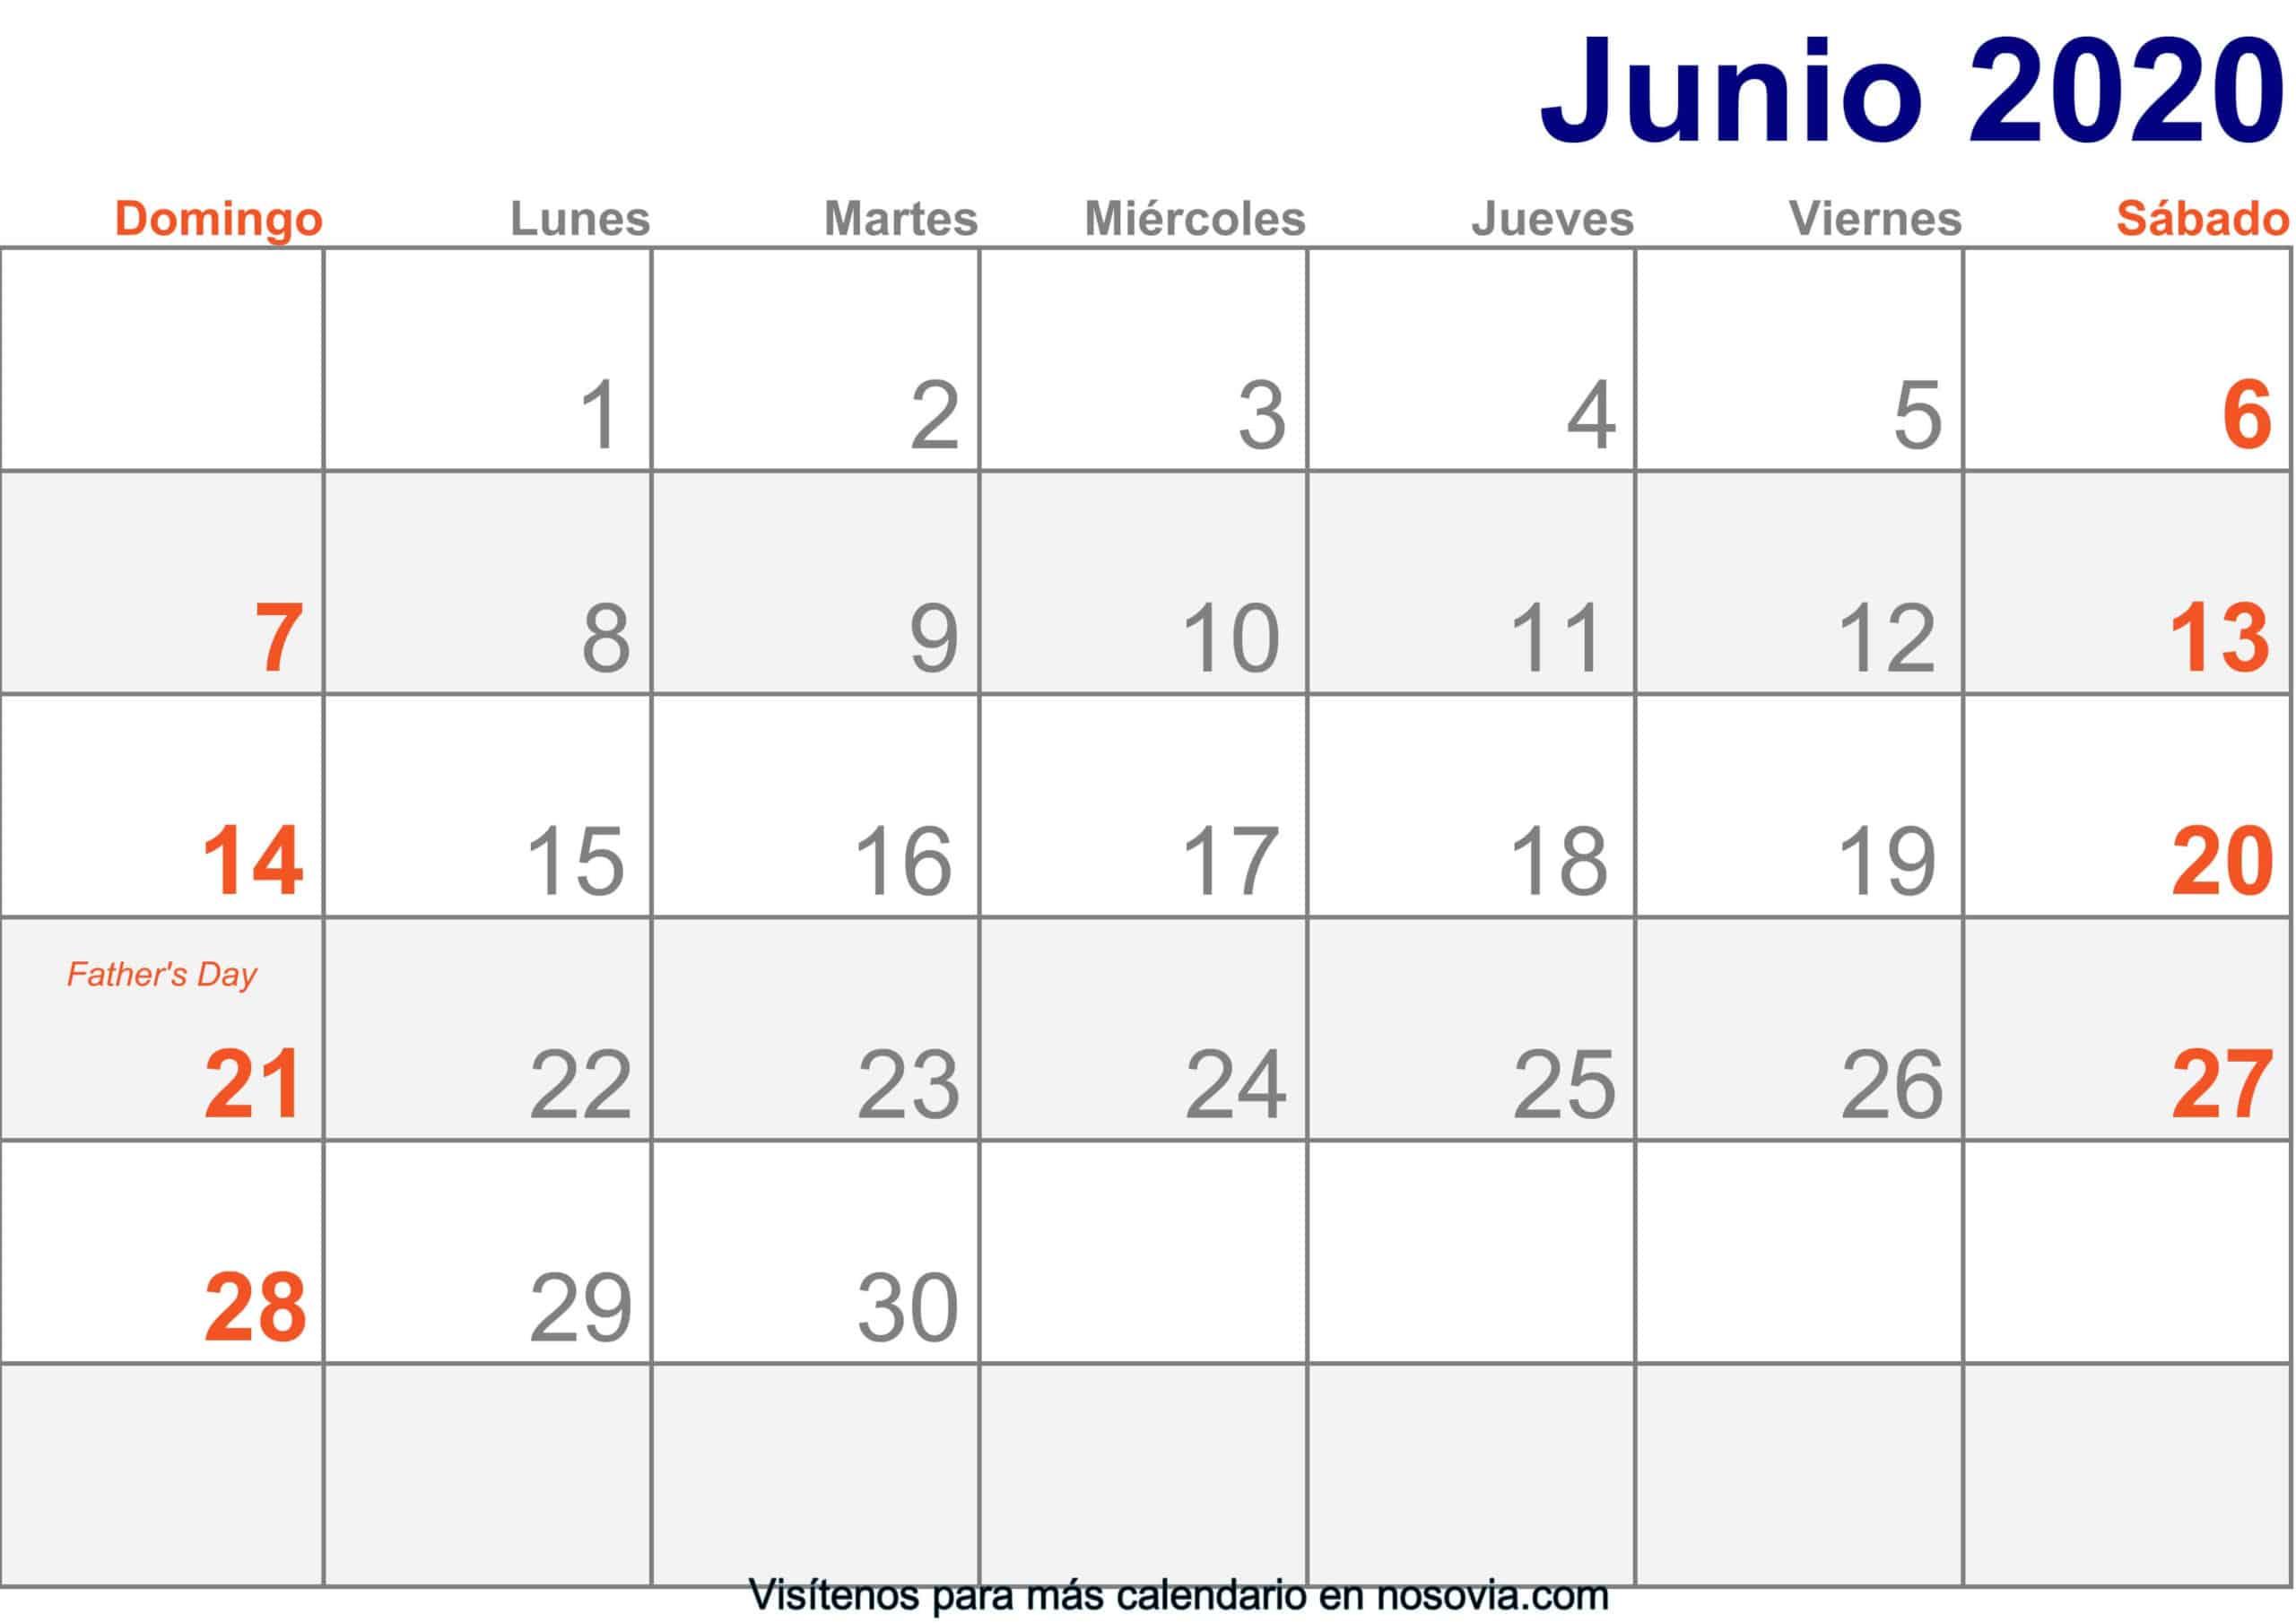 Calendario-junio-2020-Con-Festivos-Imprimir